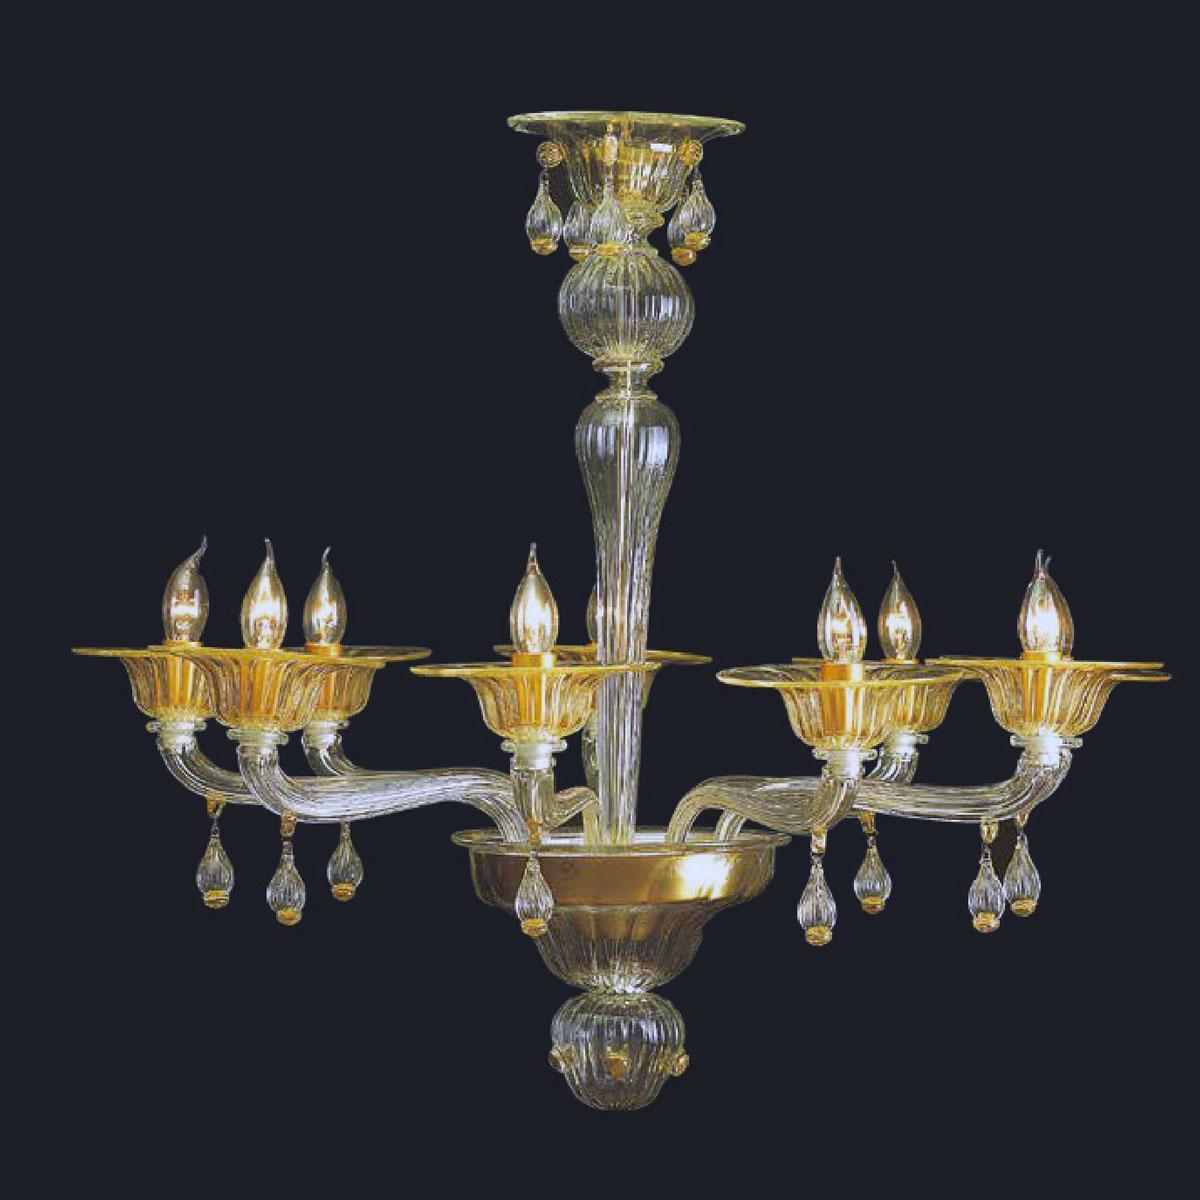 """Noreen"" lampara de araña de Murano - 9 luces - transparente y oro"